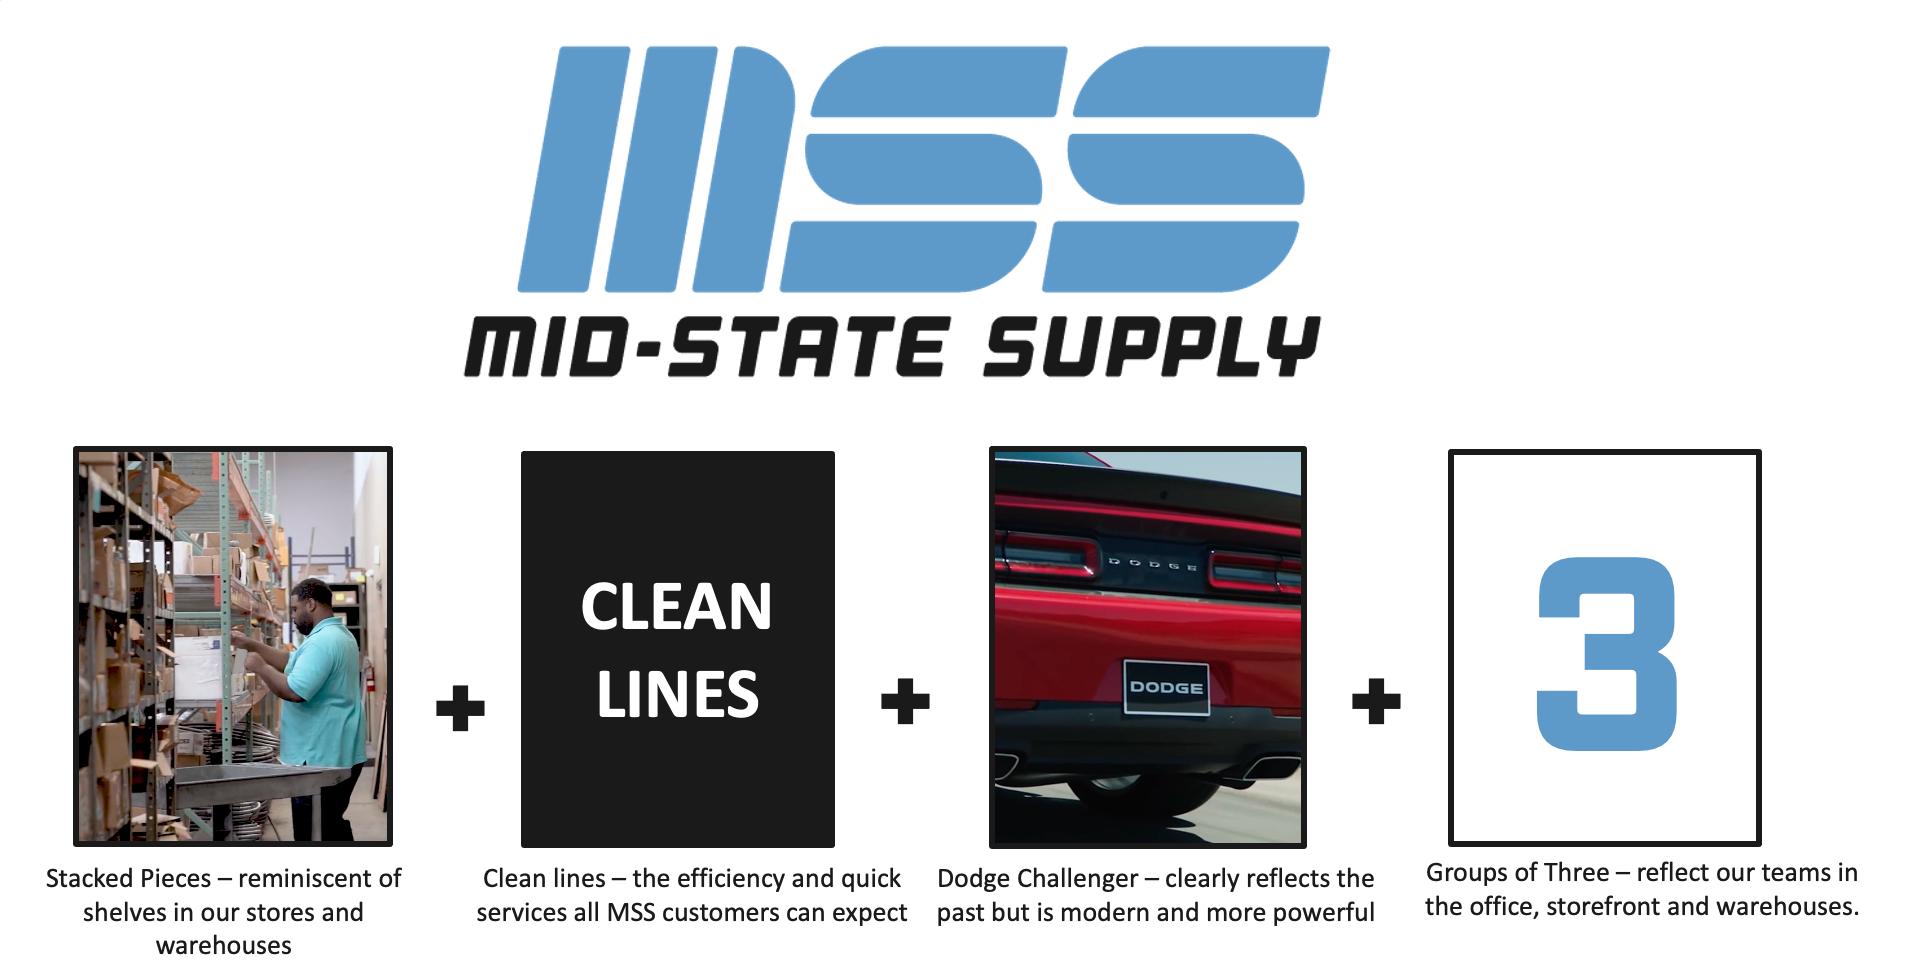 MSS Logo Explained